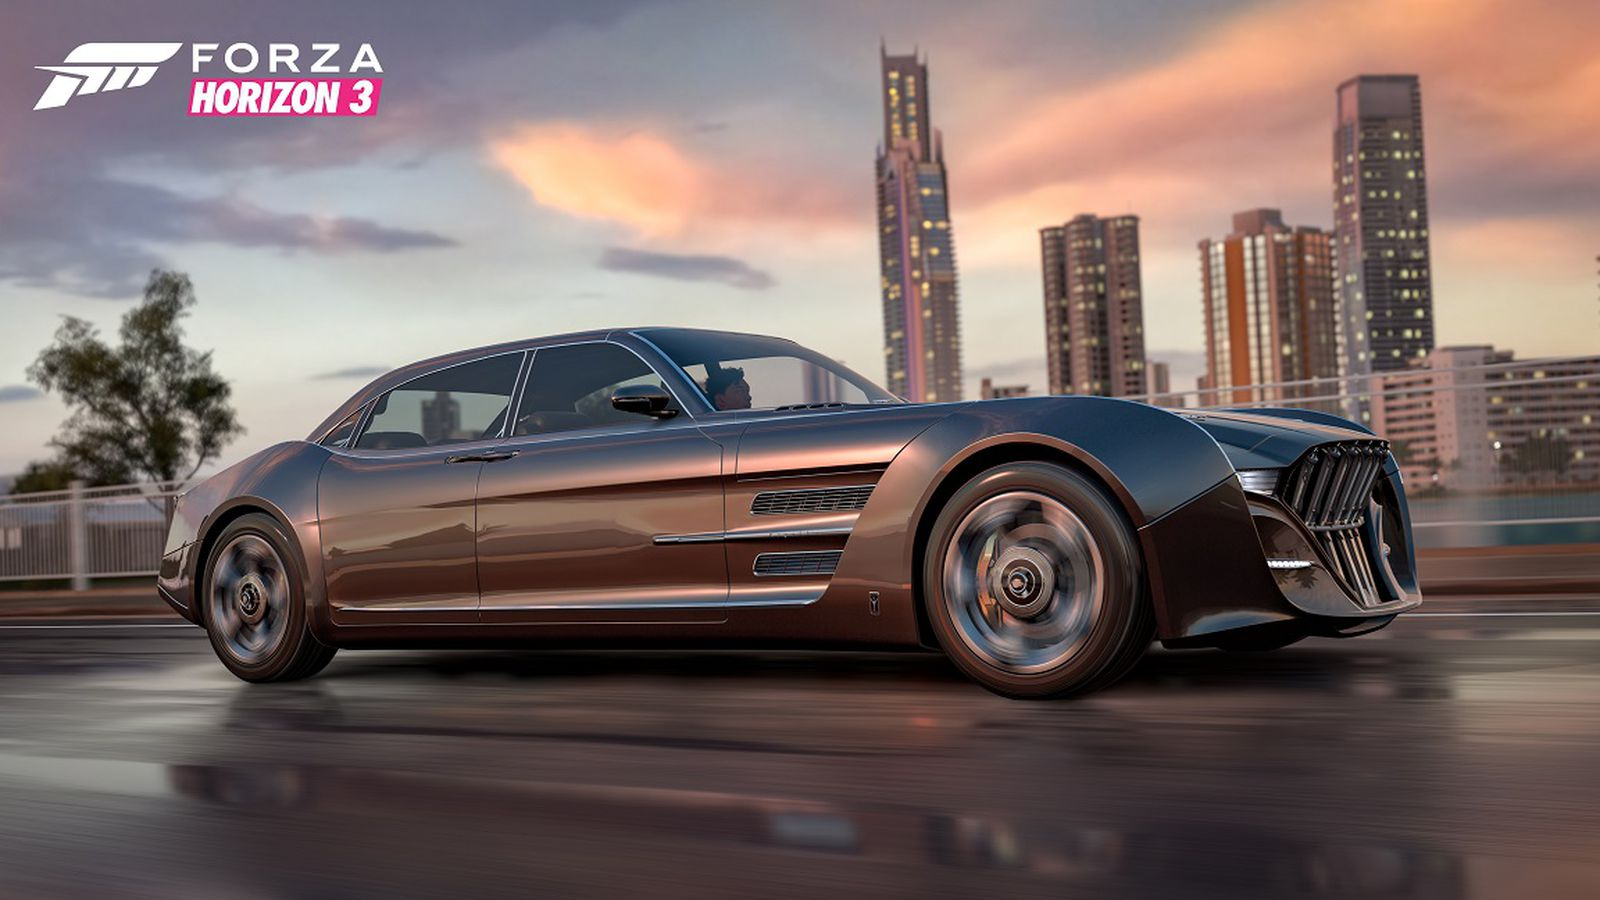 Final Fantasy Xv S Ultra Luxurious Regalia Car Is Coming To Forza Horizon 3 The Verge